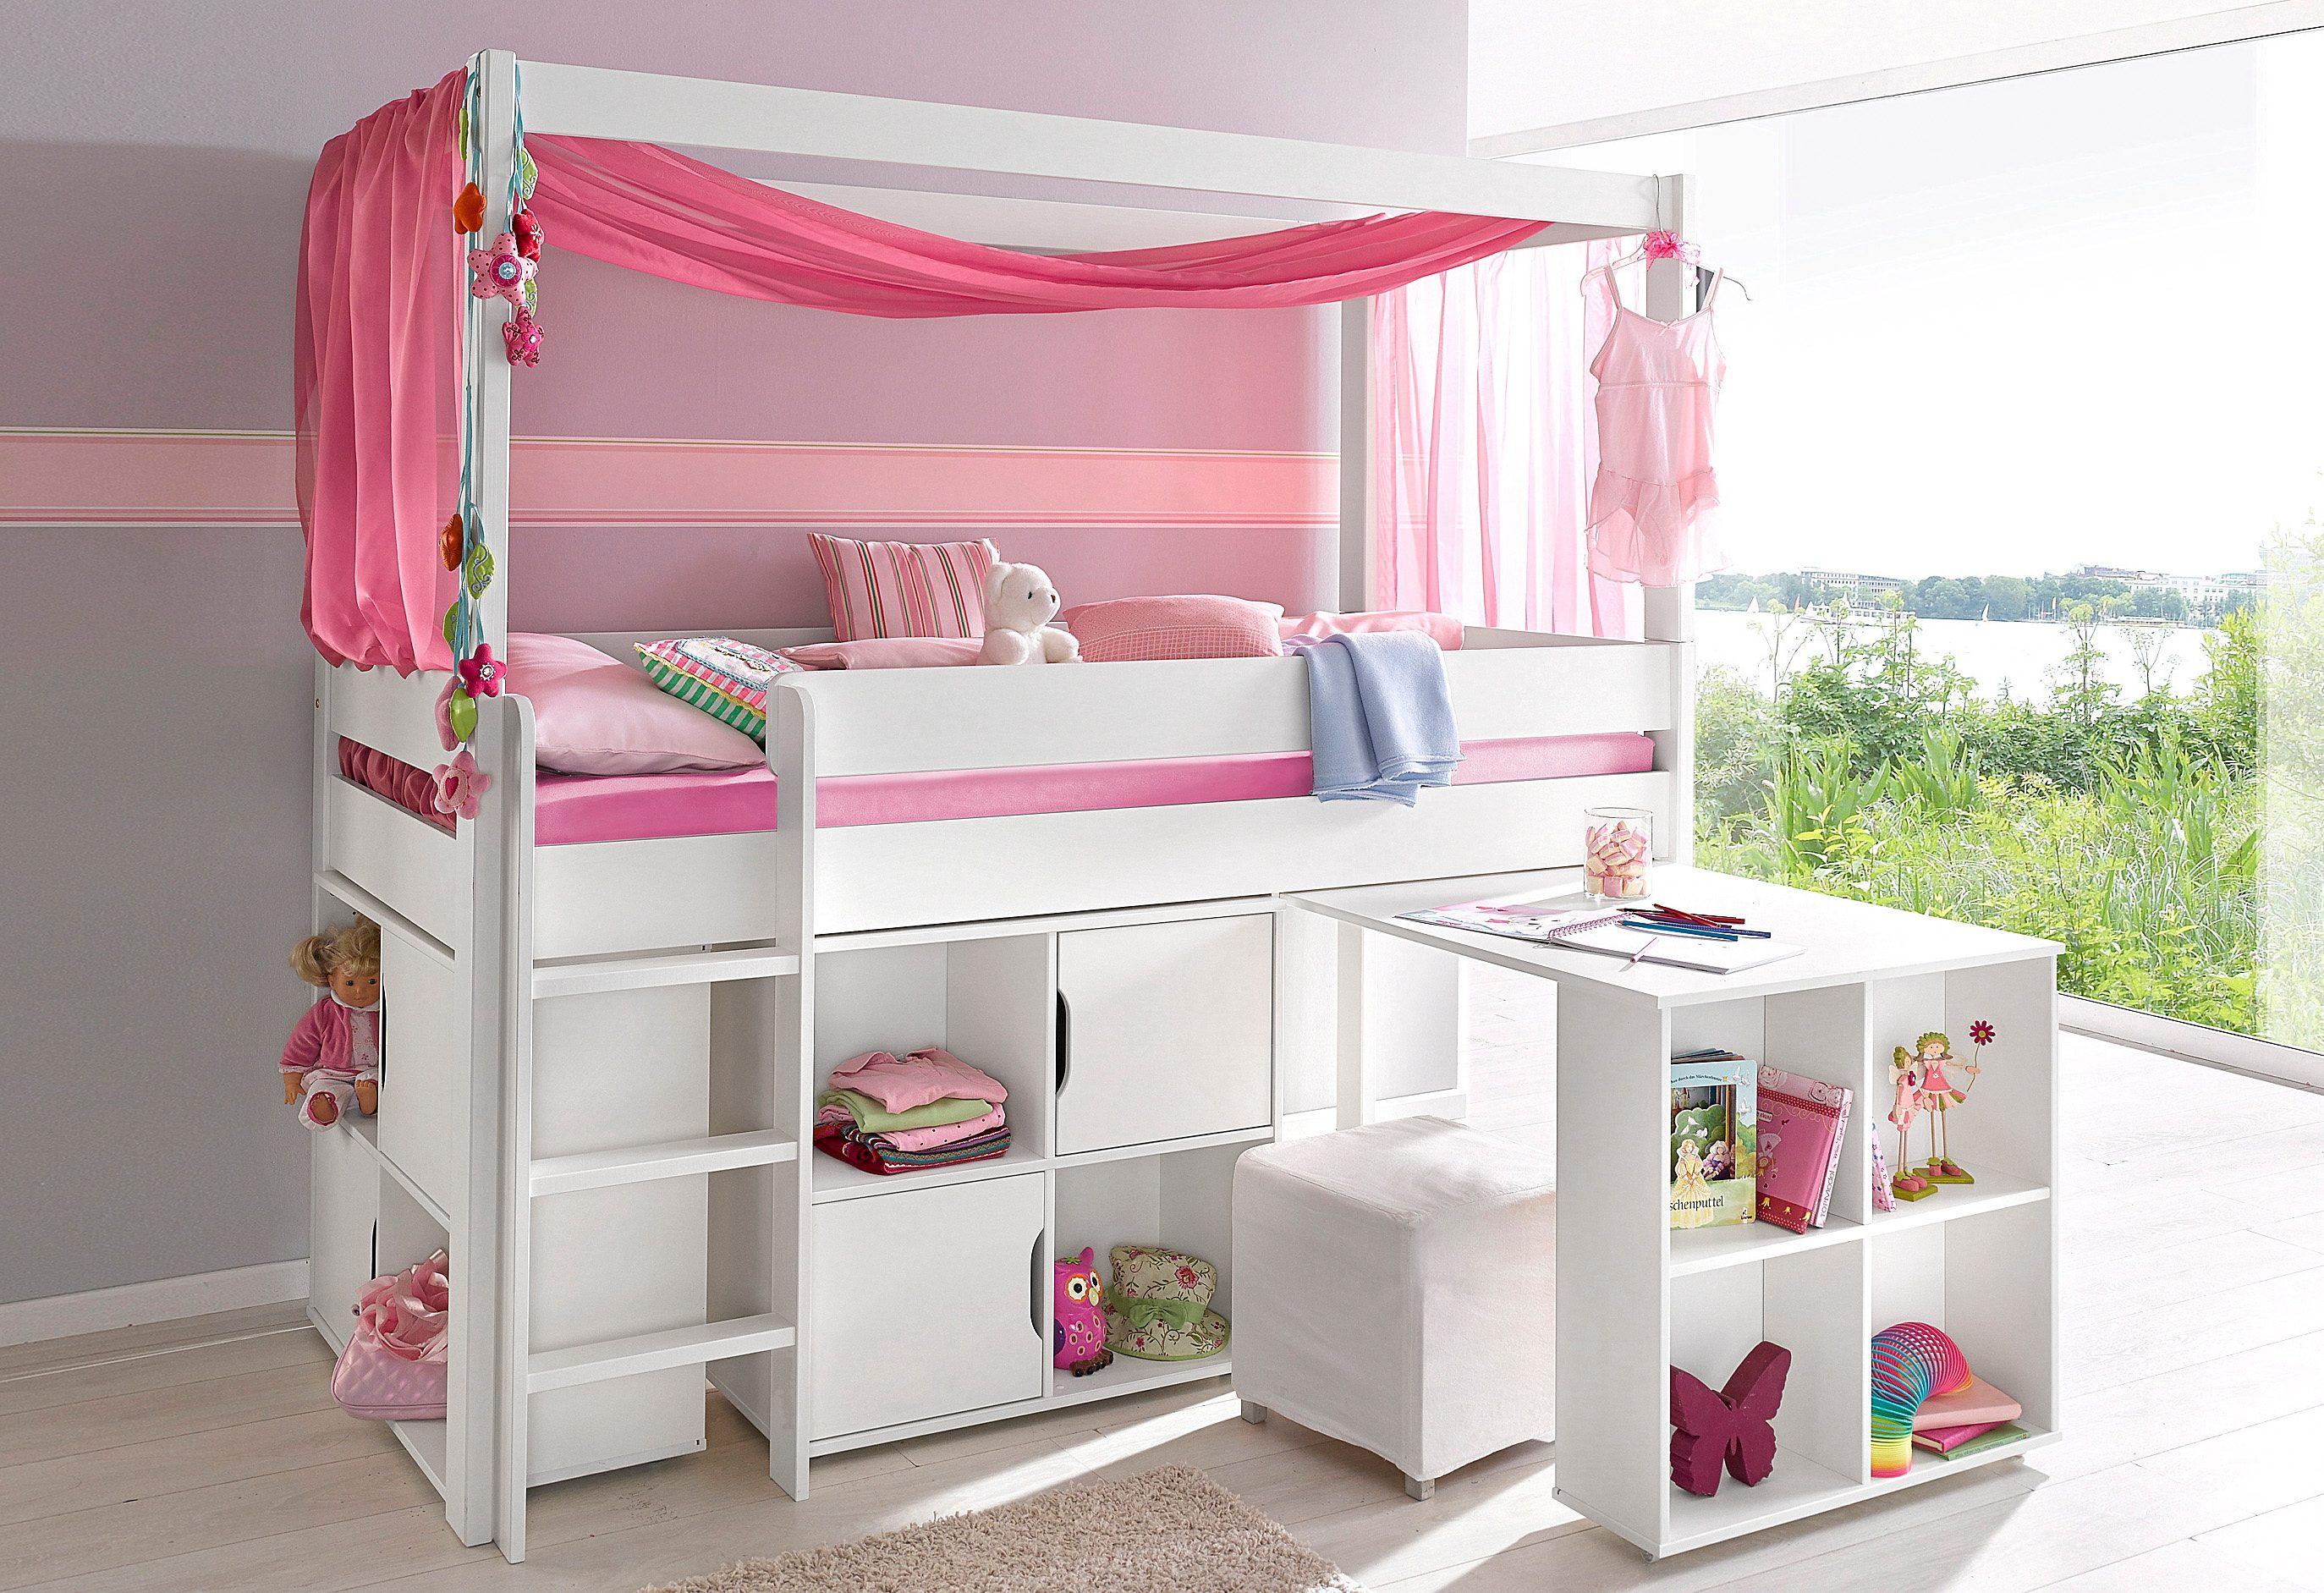 Hochbett Wohnen/Möbel/Betten/Kinderbetten/Hochbetten